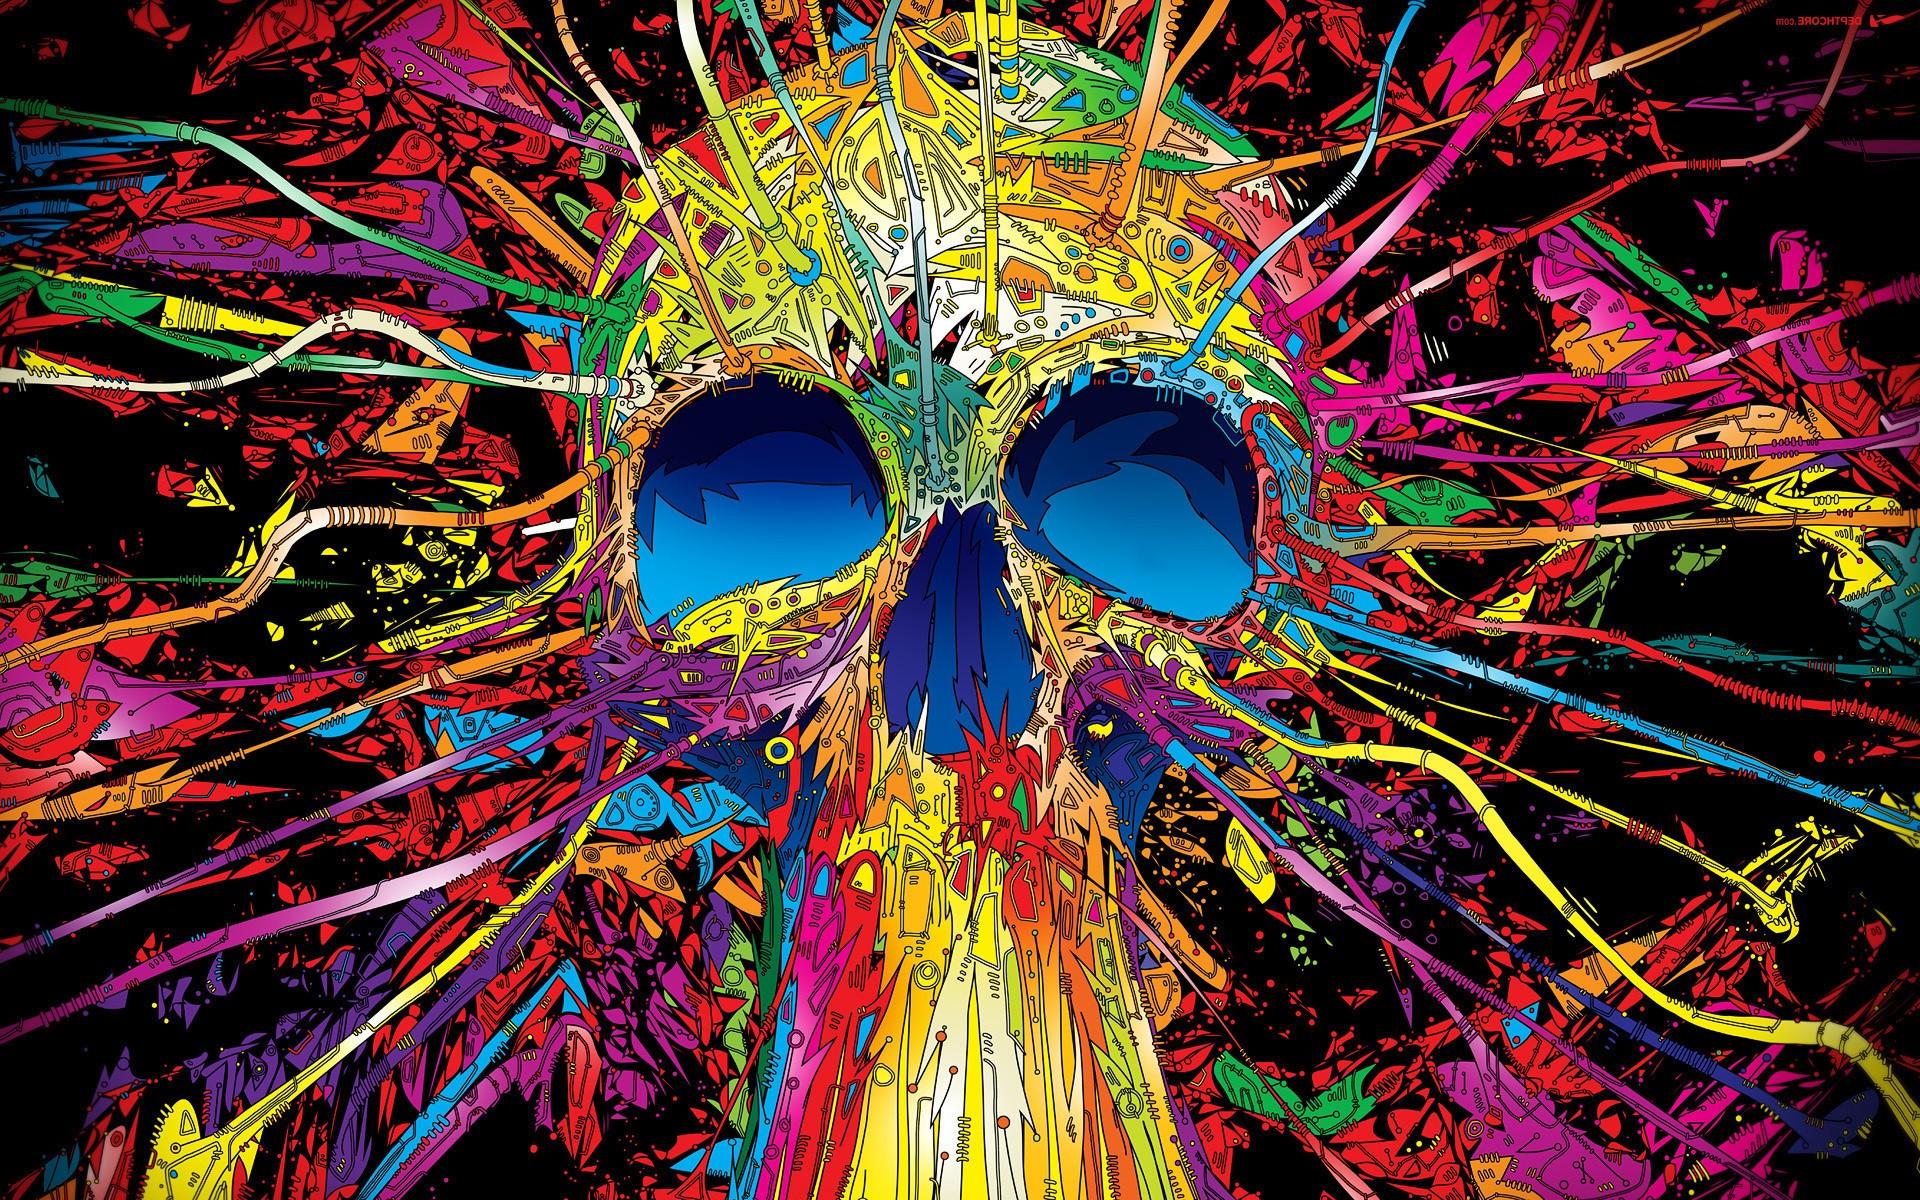 Wallpaper Illustration Digital Art Anime Abstract Artwork Symmetry Graphic Design Pattern Skull Matei Apostolescu Carnival Art Graphics 1920x1200 Px Computer Wallpaper Fractal Art Special Effects Psychedelic Art Organism 1920x1200